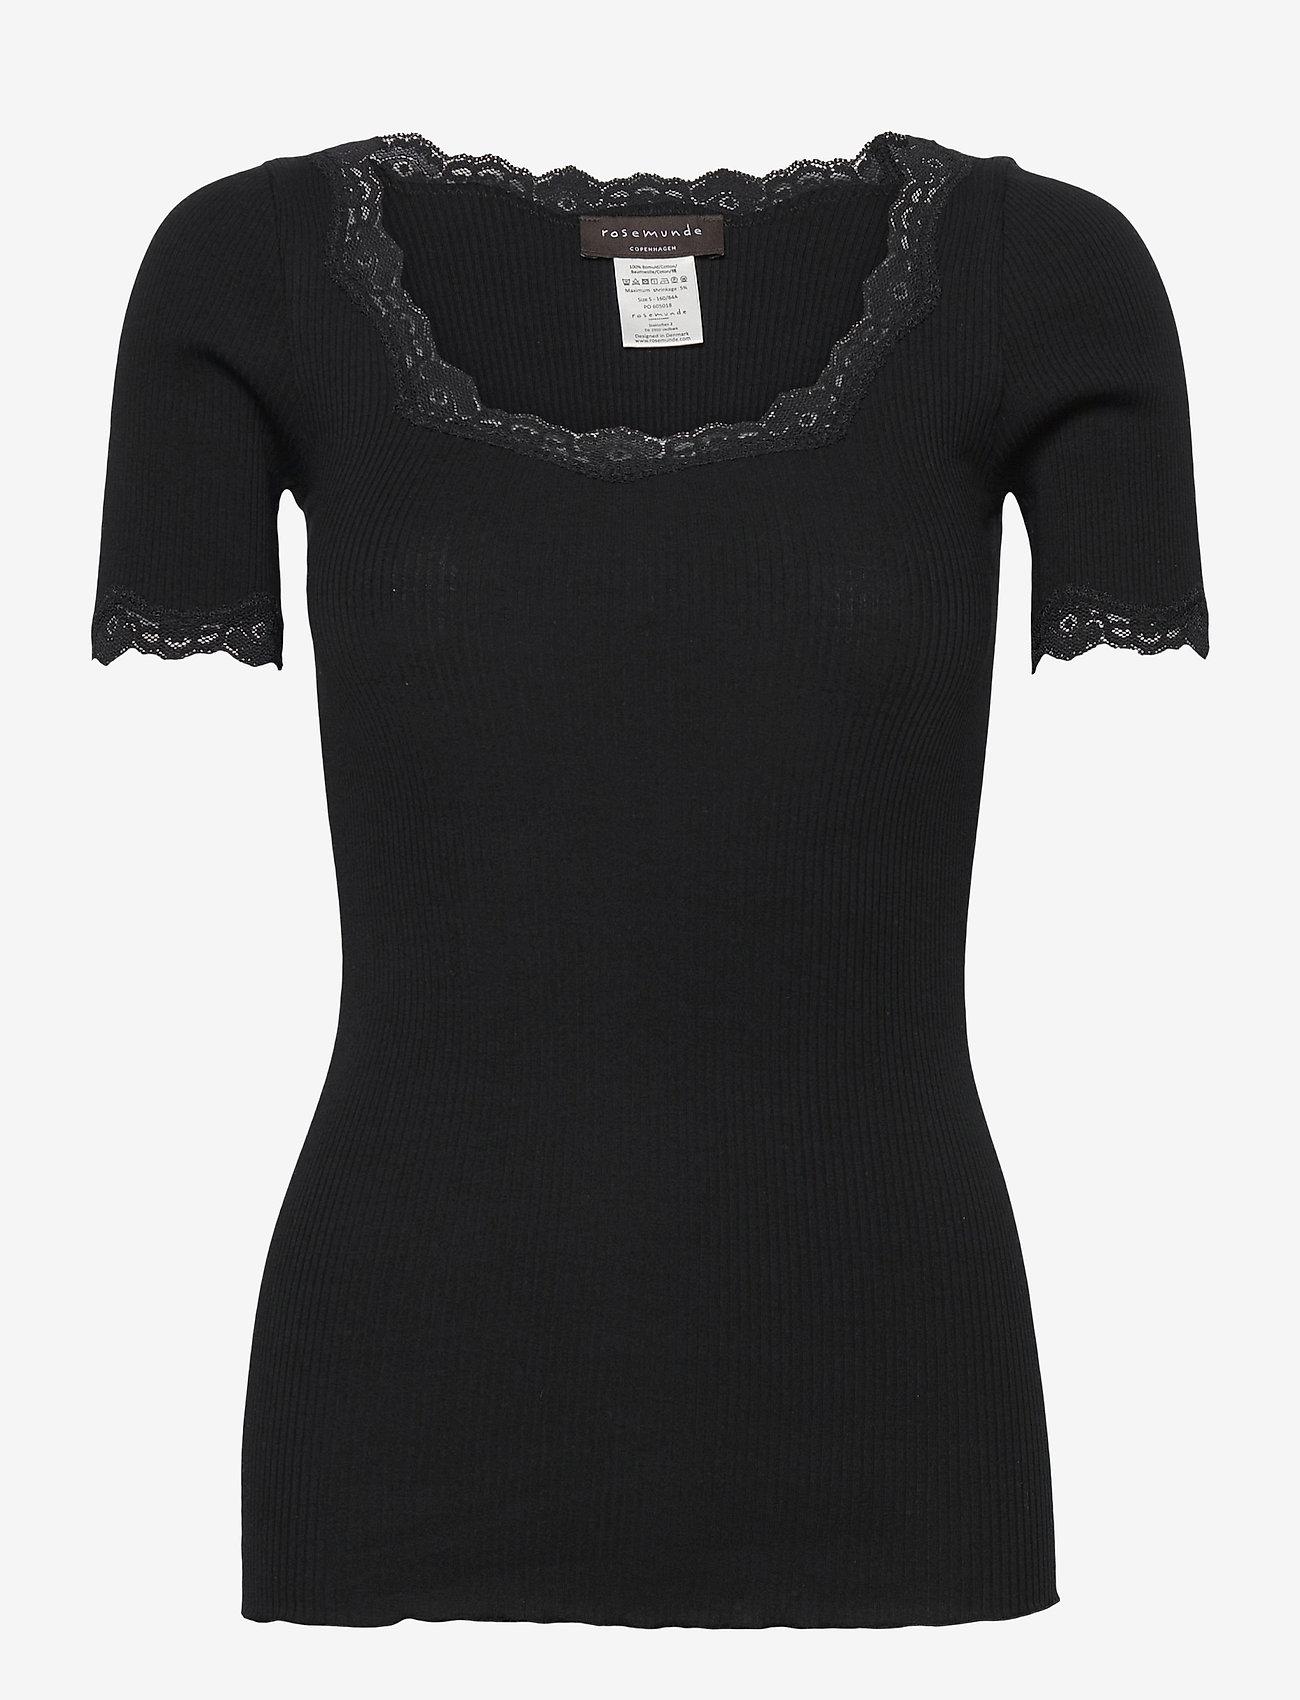 Rosemunde - Organic t-shirt regular ss w/ rev,v - t-shirts - black - 0